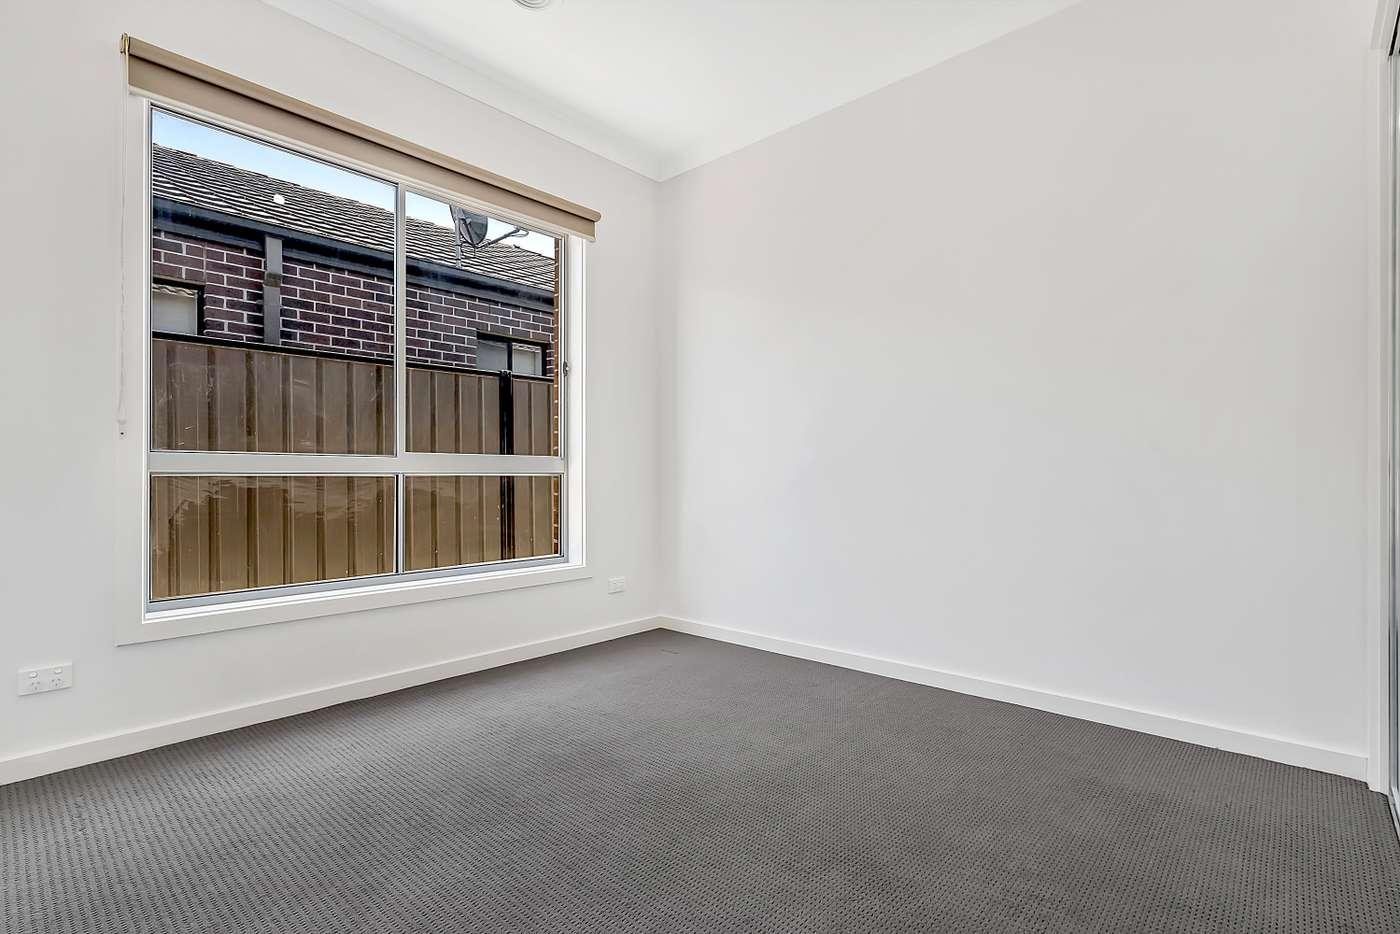 Seventh view of Homely house listing, 20 Crosskeys Road, Craigieburn VIC 3064